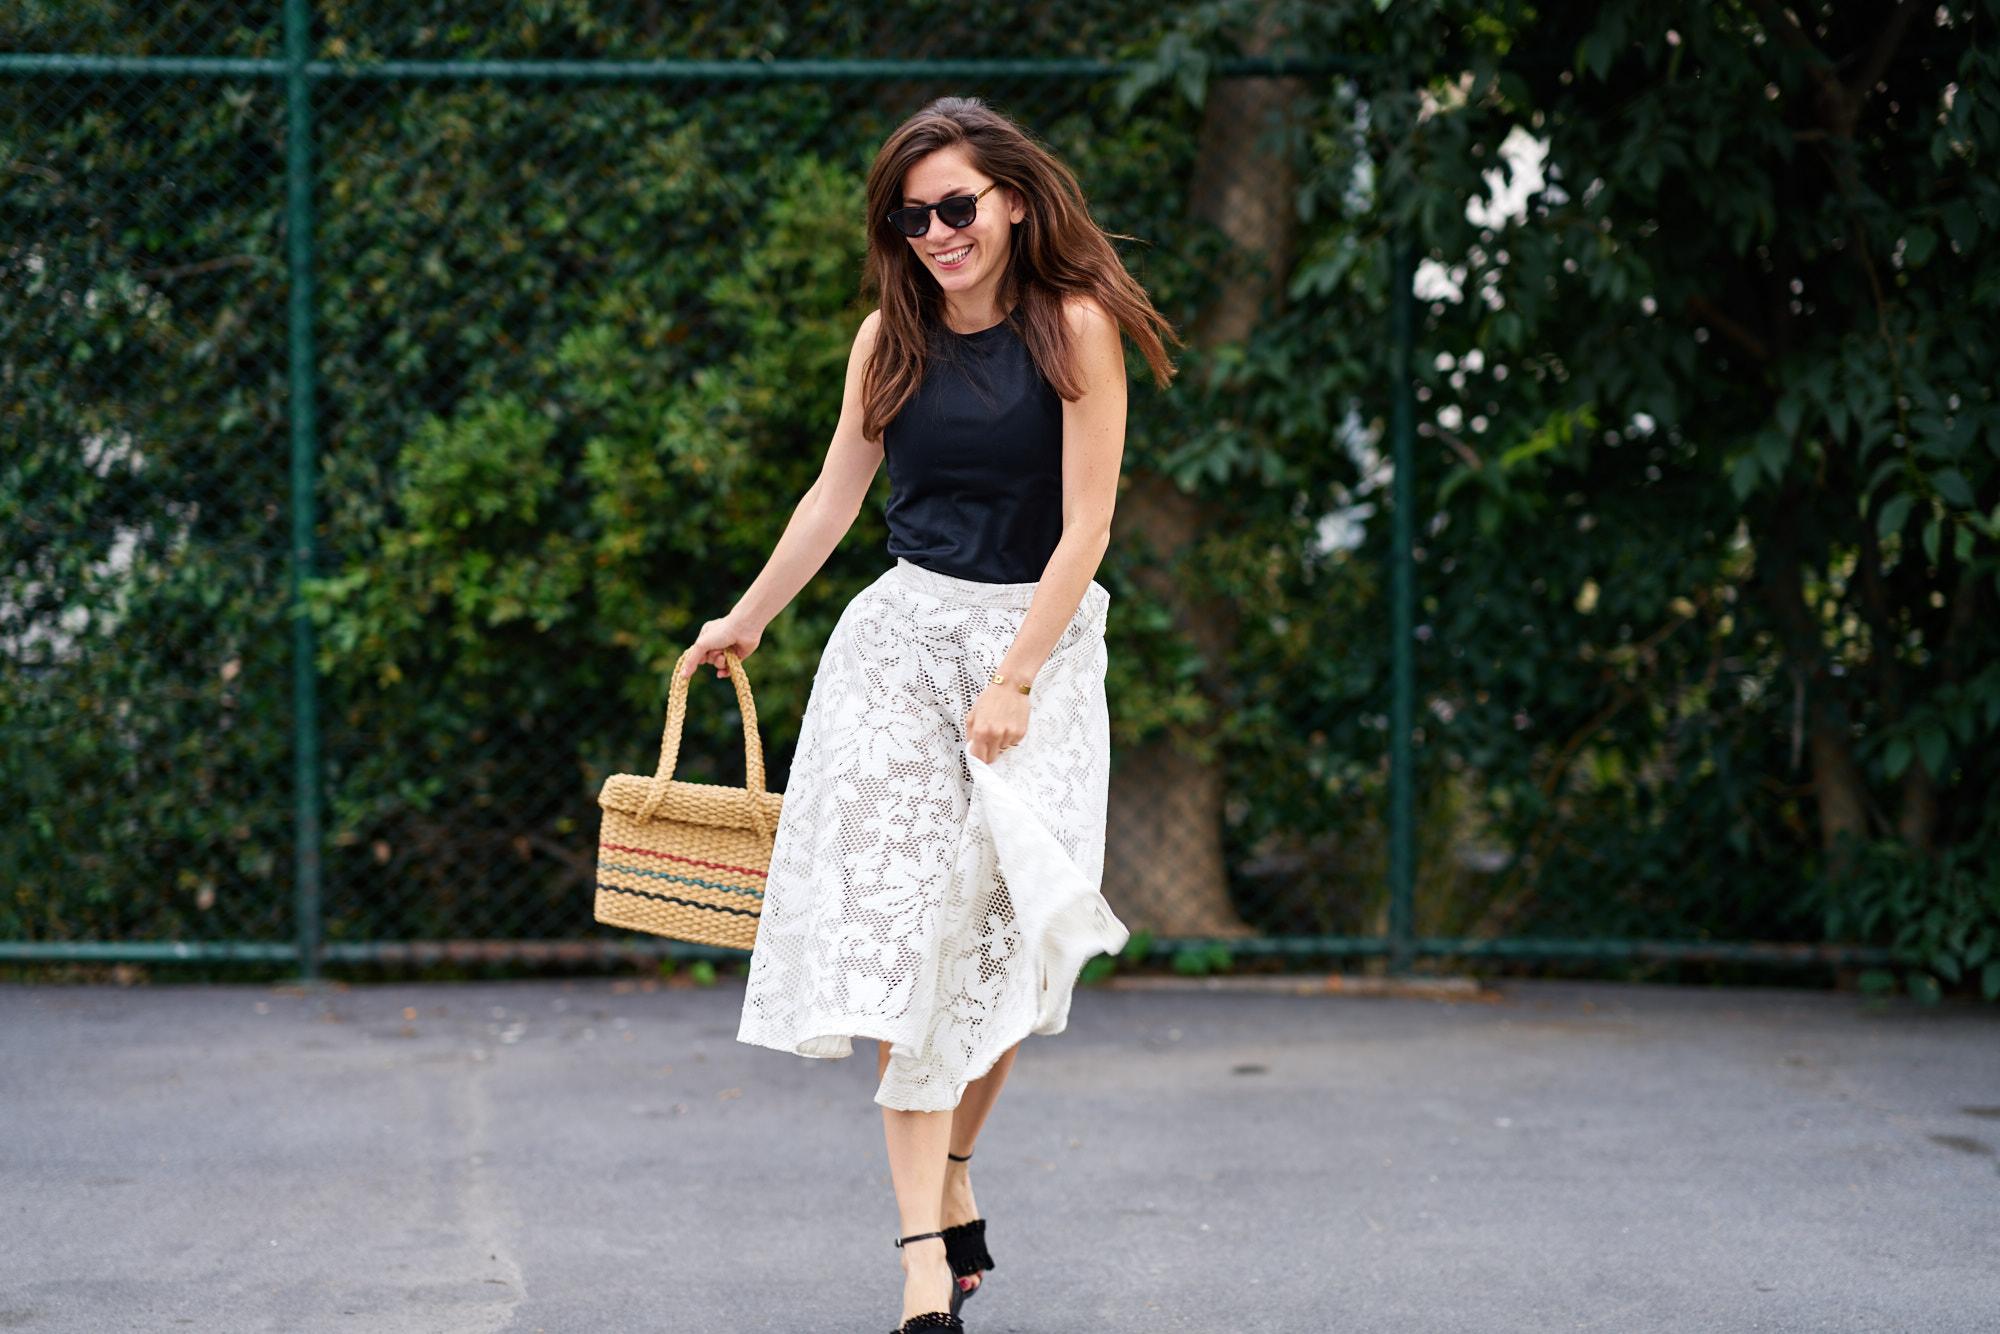 billur saatci, offnegiysem, street style, turkish style blogger, fey, nevarsaeskilerdevar, maje, brandroom, nike,